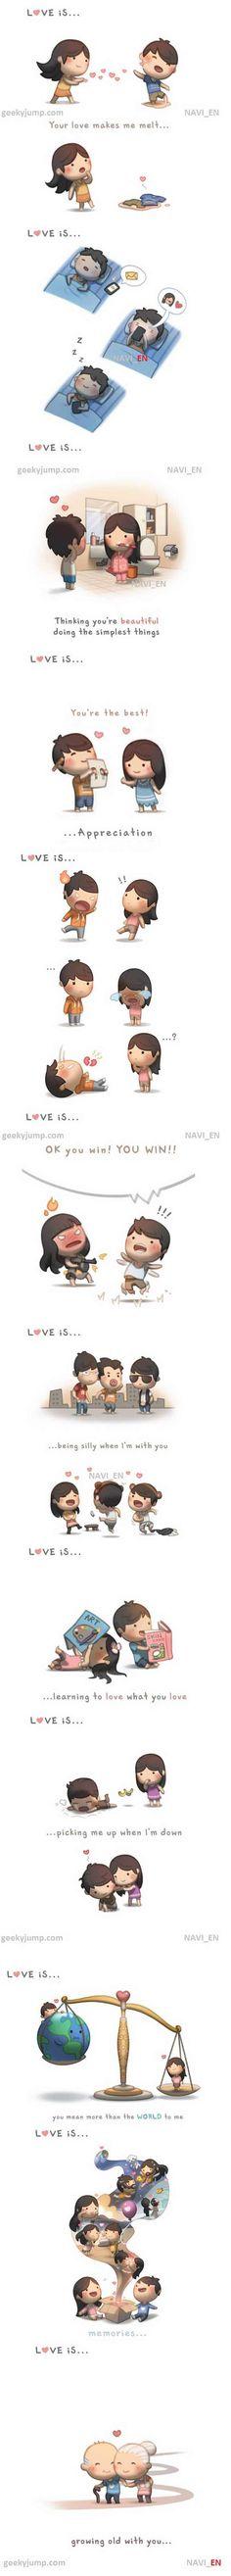 Love is... - Imgur